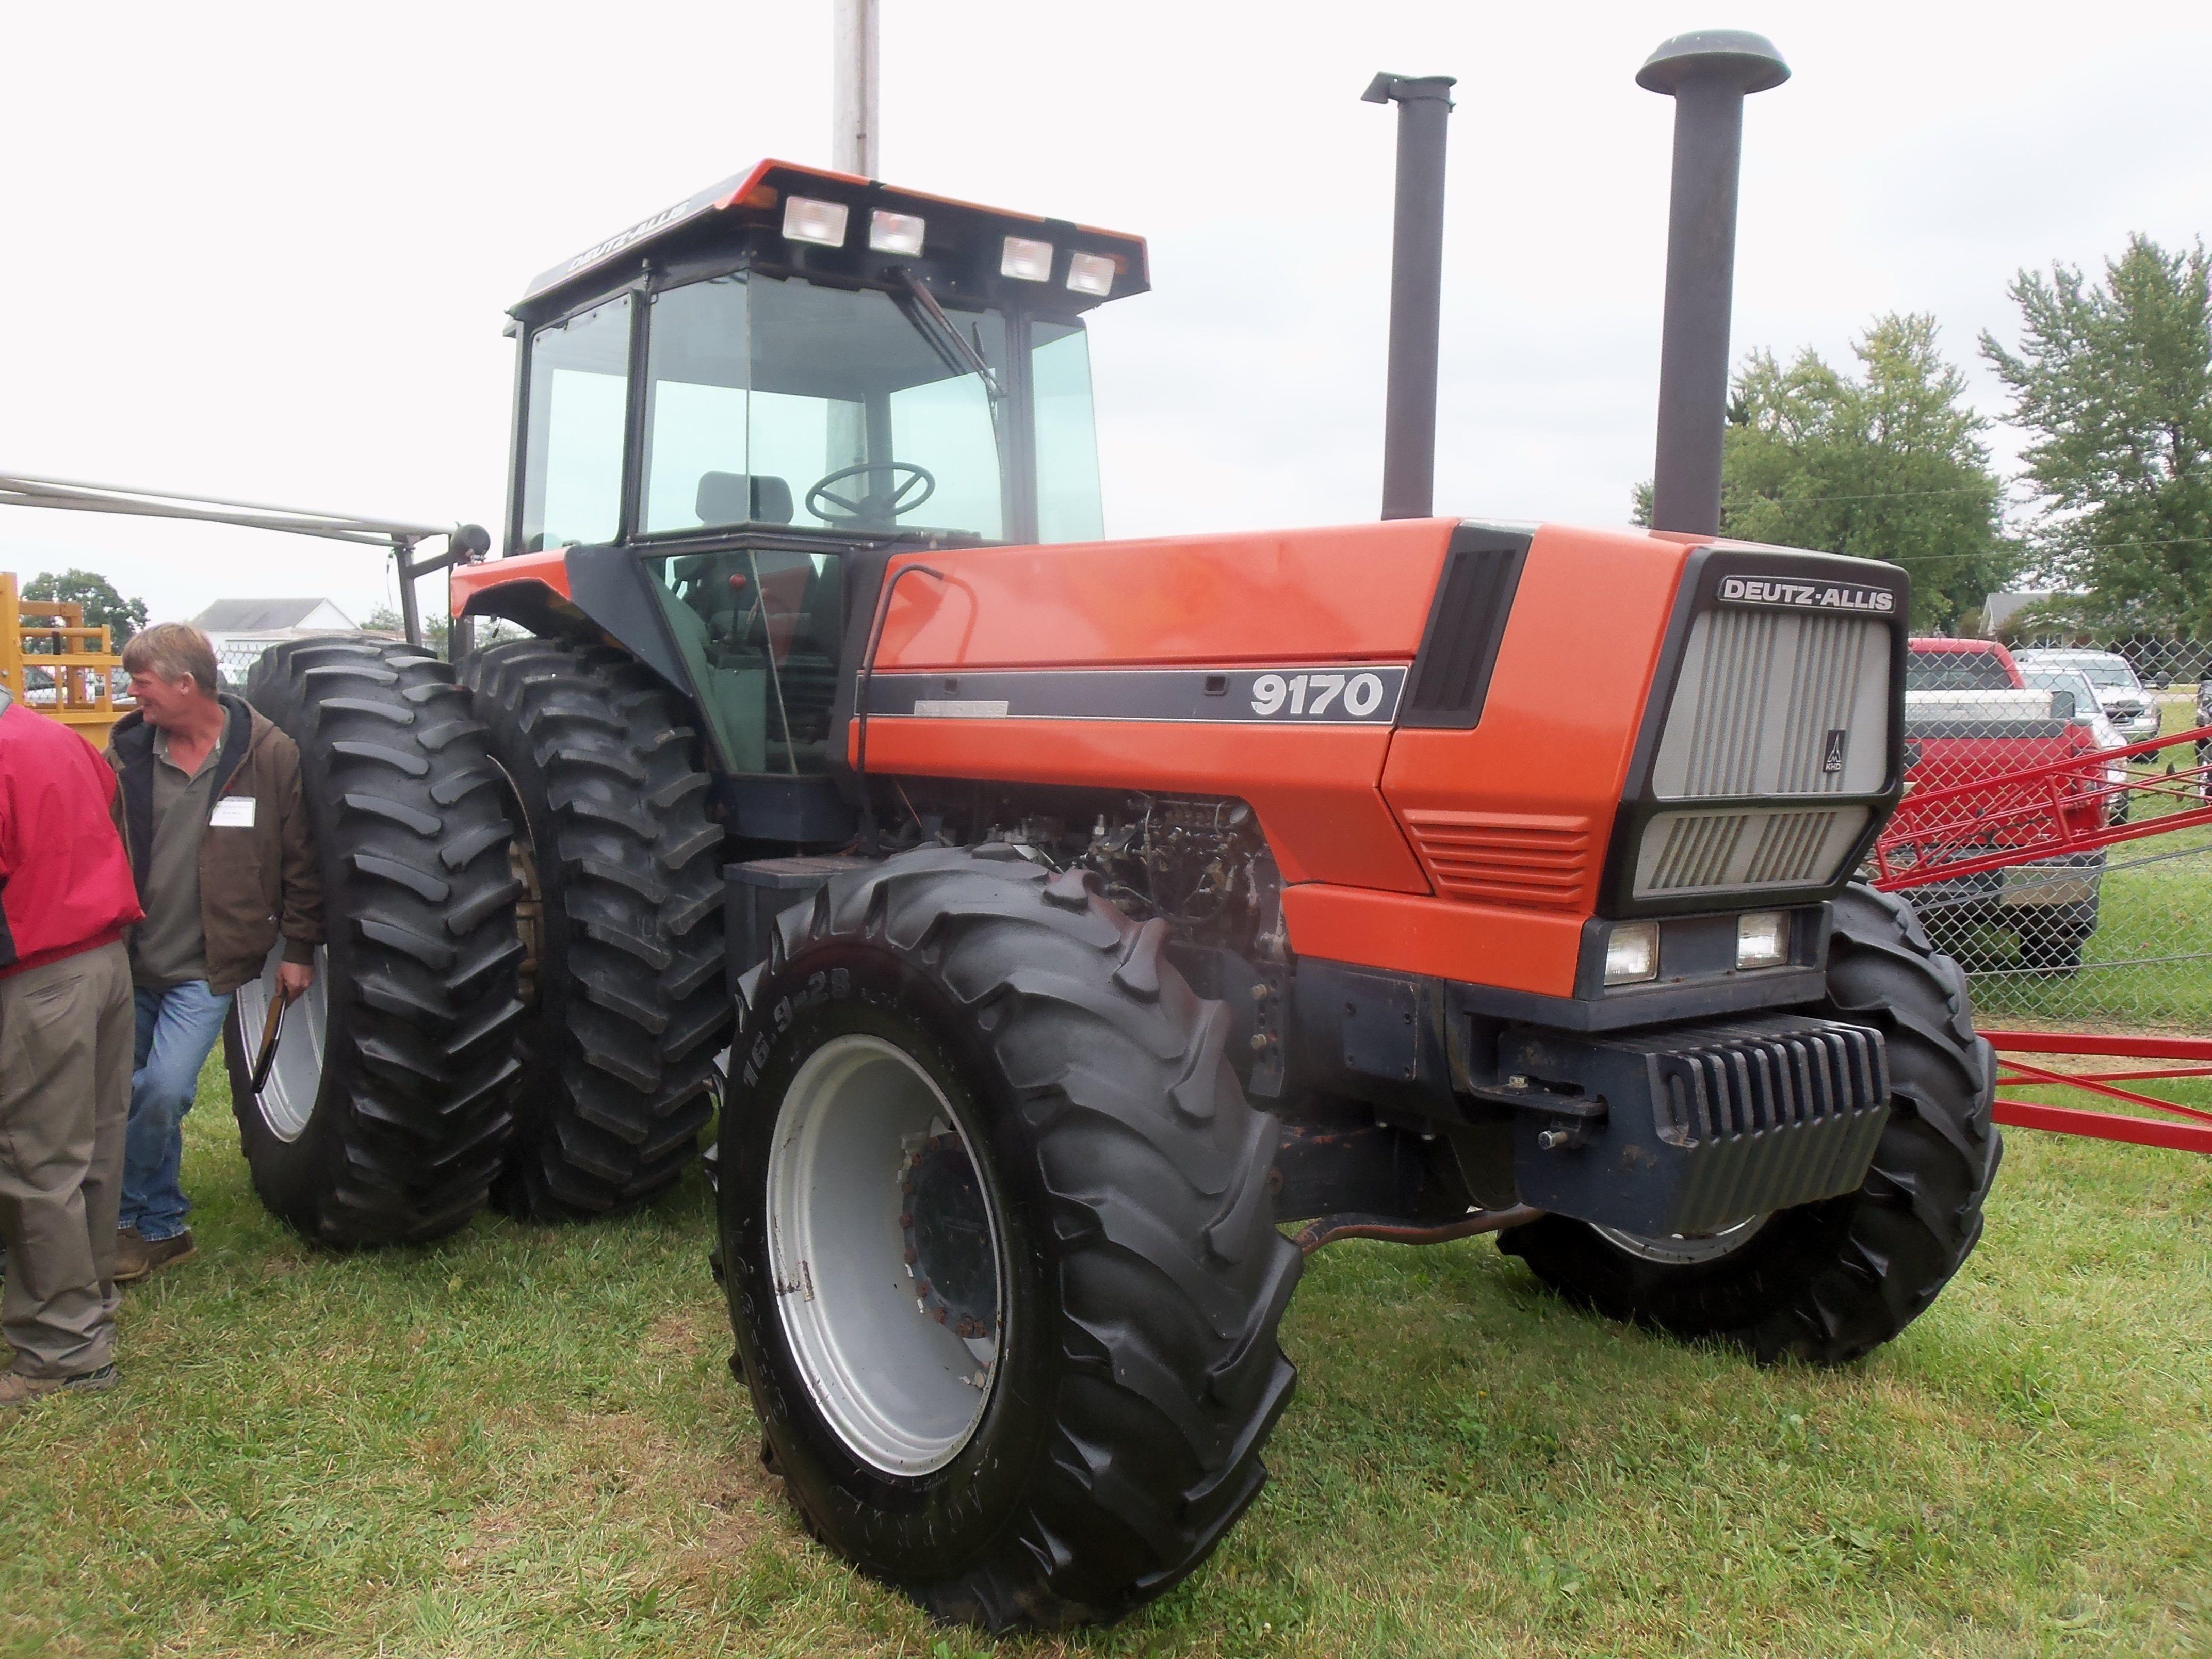 Stolz Bau deutz allis 9170 tractors